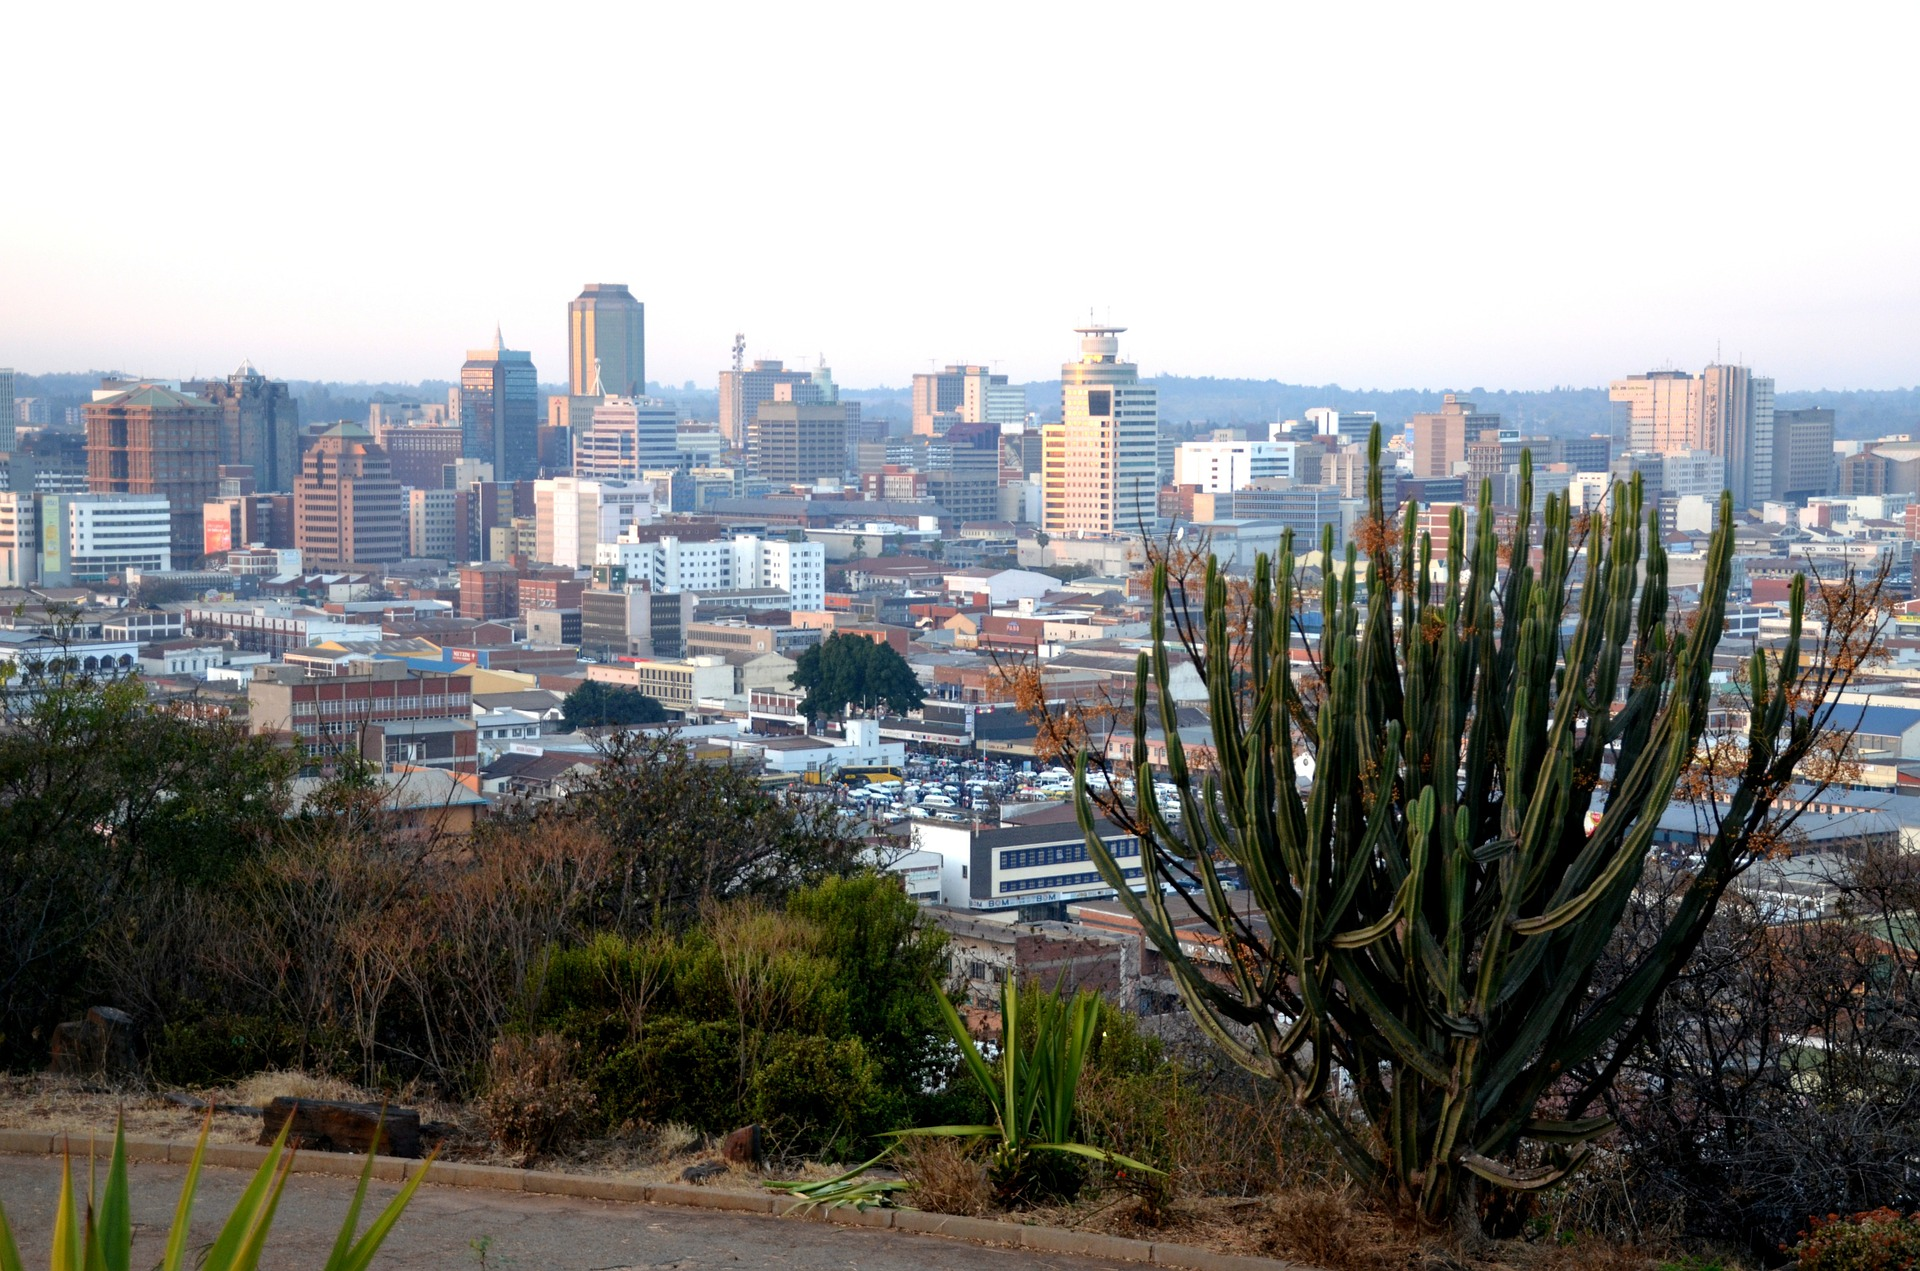 Zimbabwe's capital city of Harare.